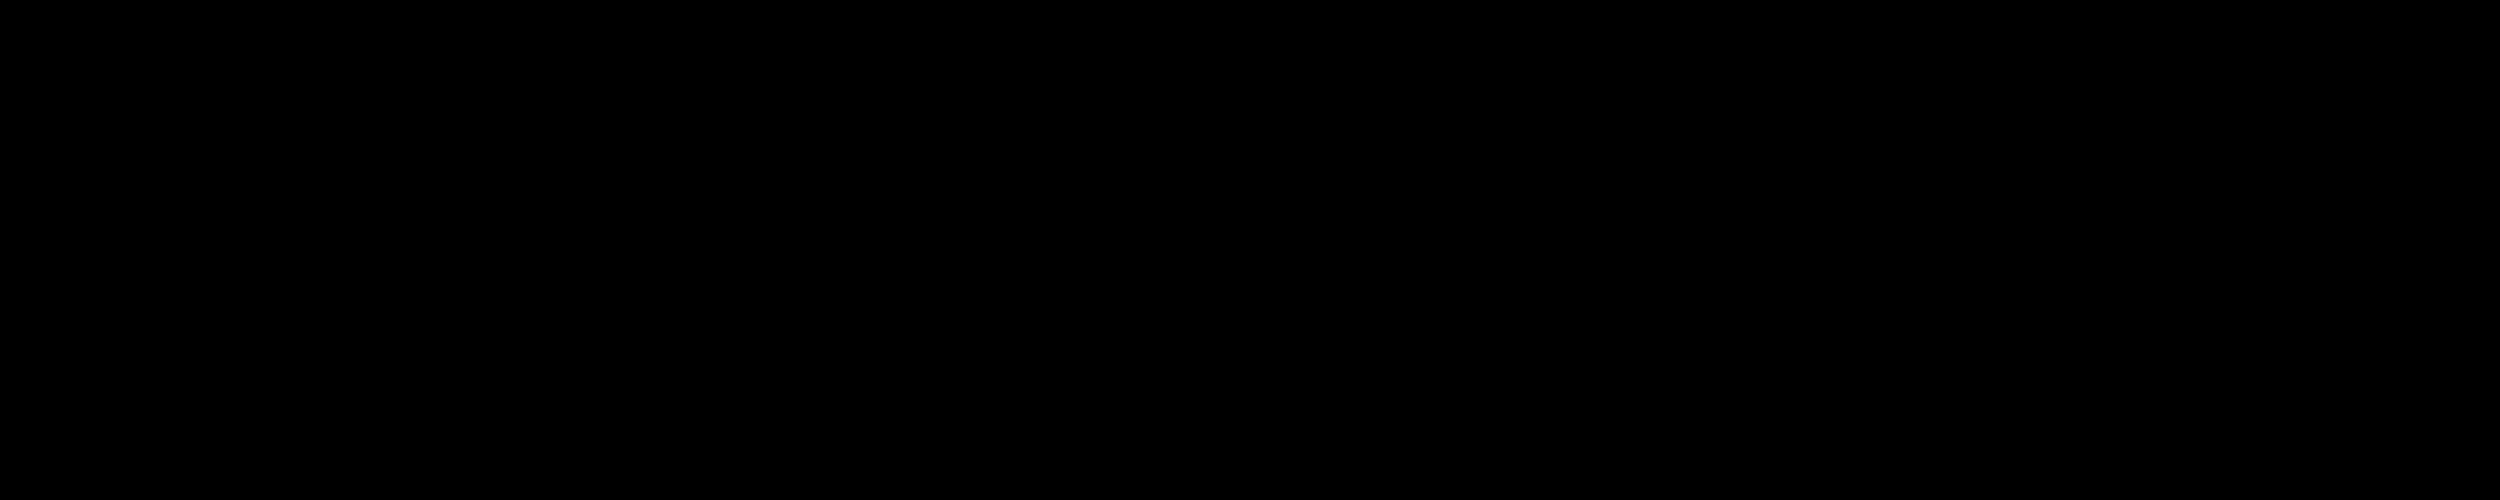 Seiko-Logo-Watches.png